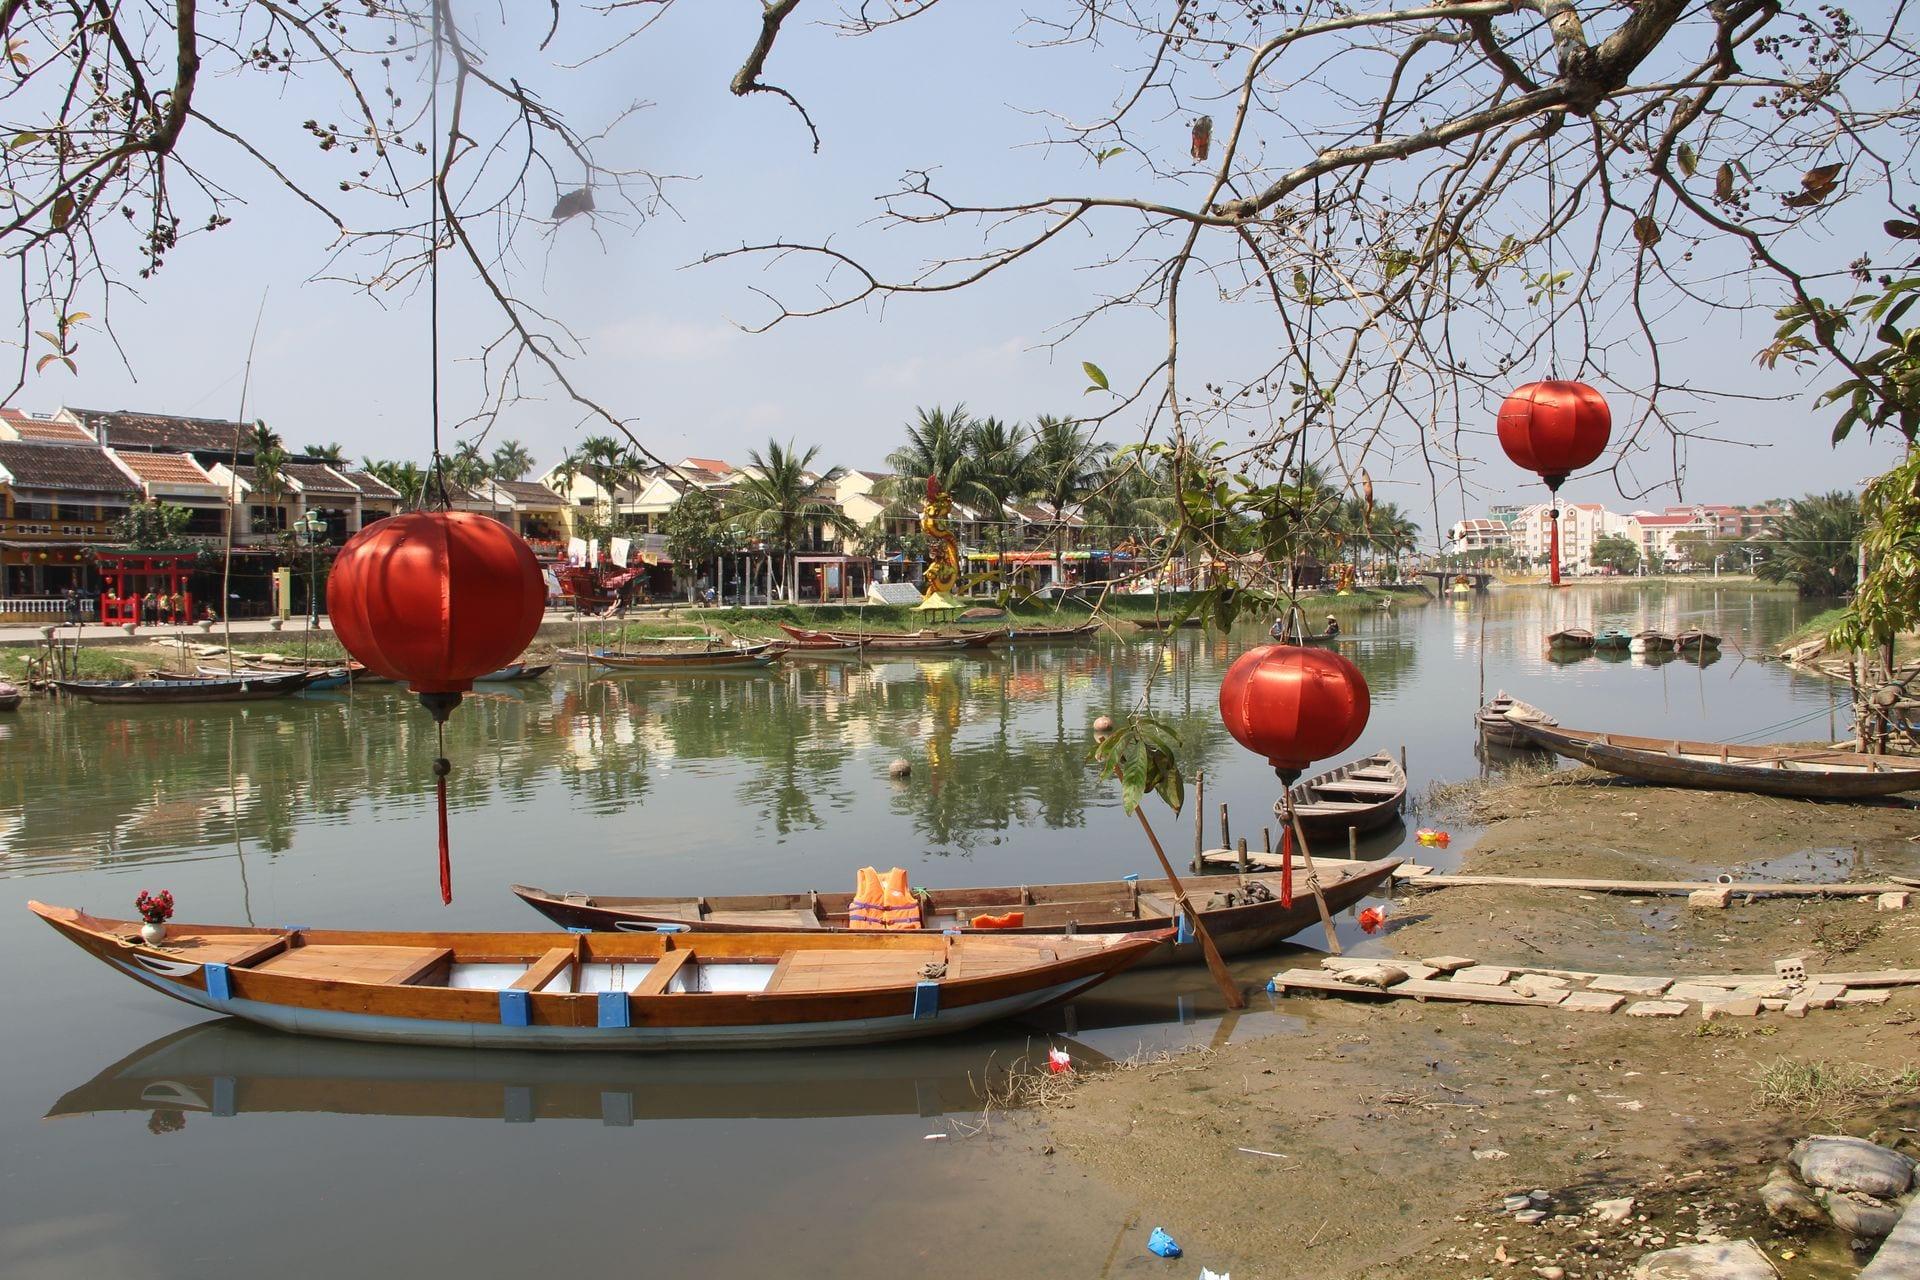 Hoi An Boat 3